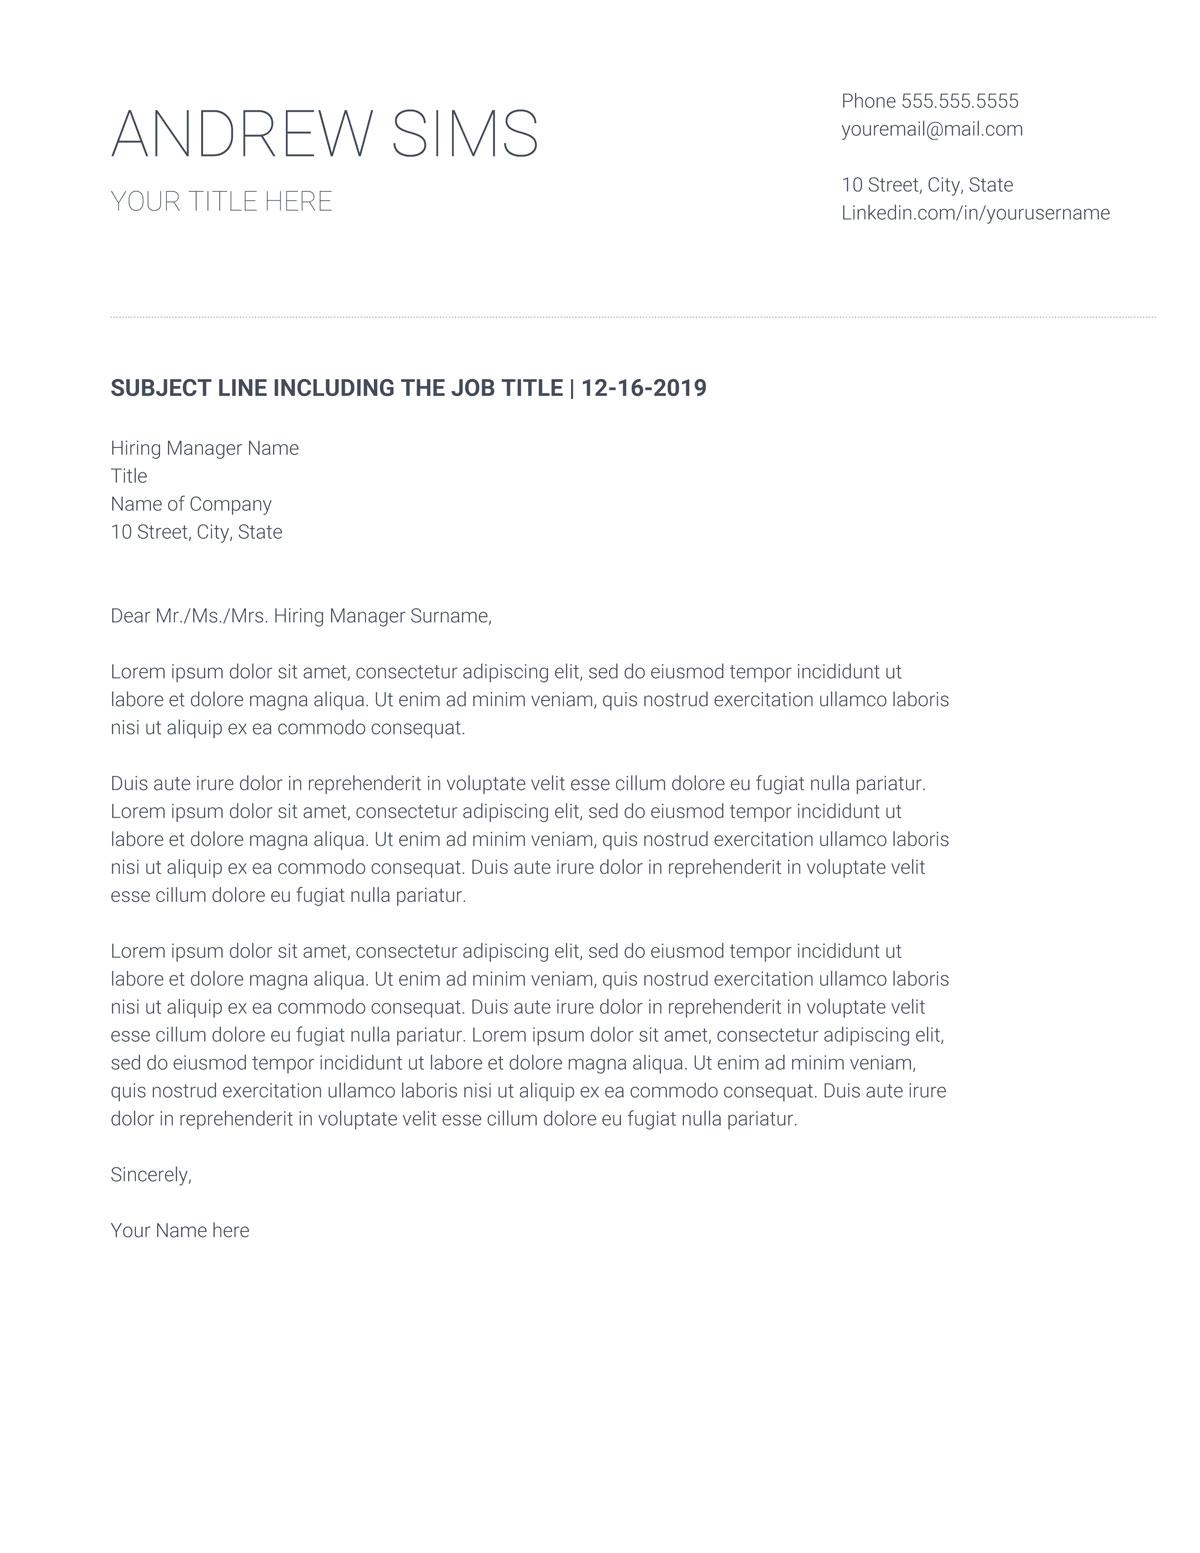 Google Docs Cover Letter Template from www.bewerbungsprofi.net